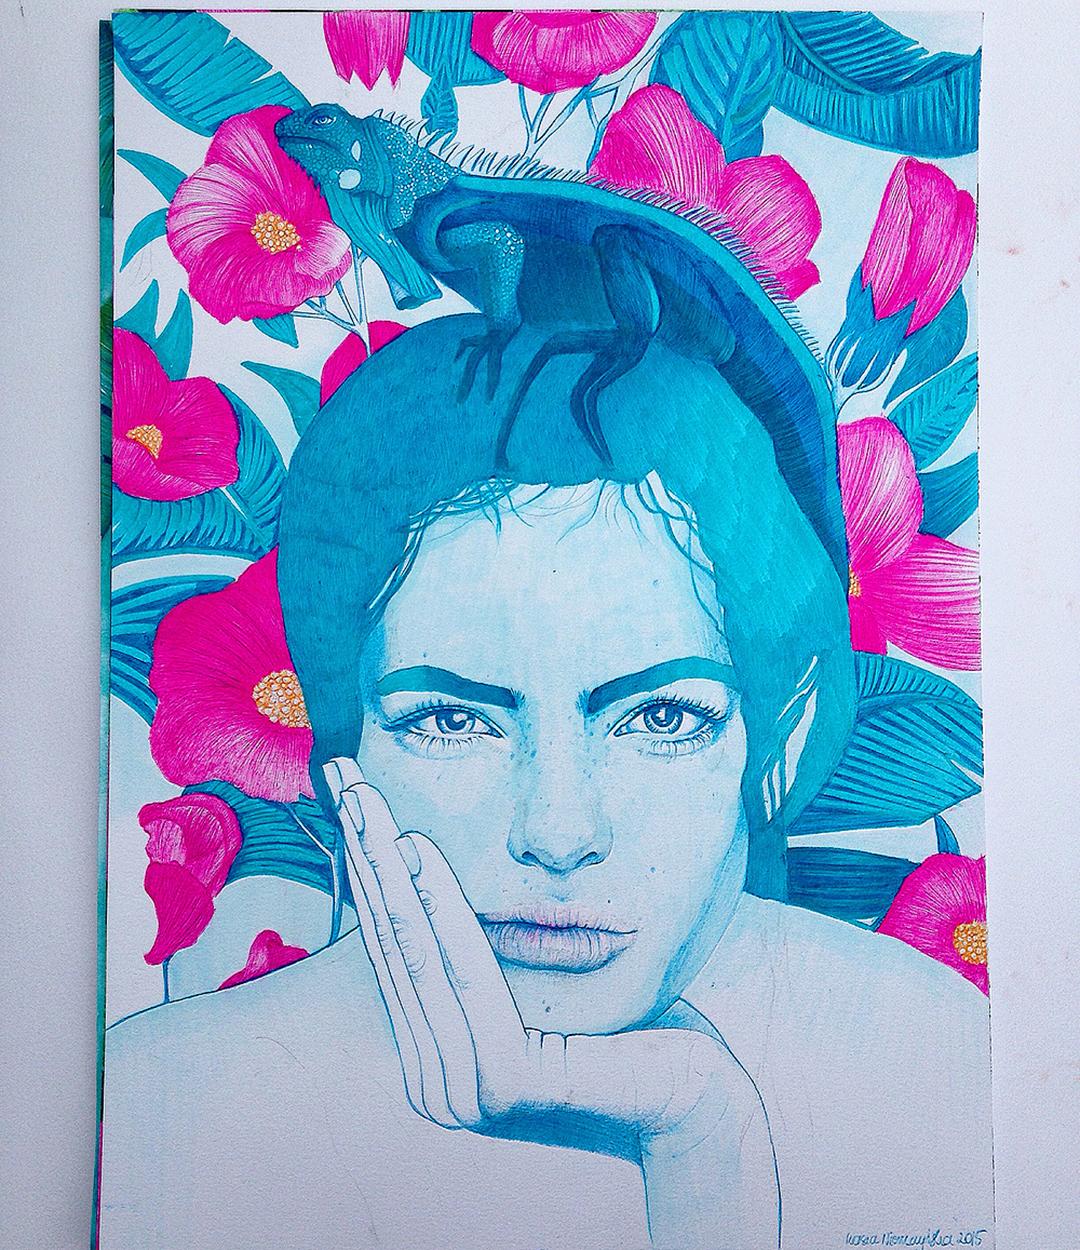 Interview with illustrator/Artist Kasia on Jung Katz Art Blog